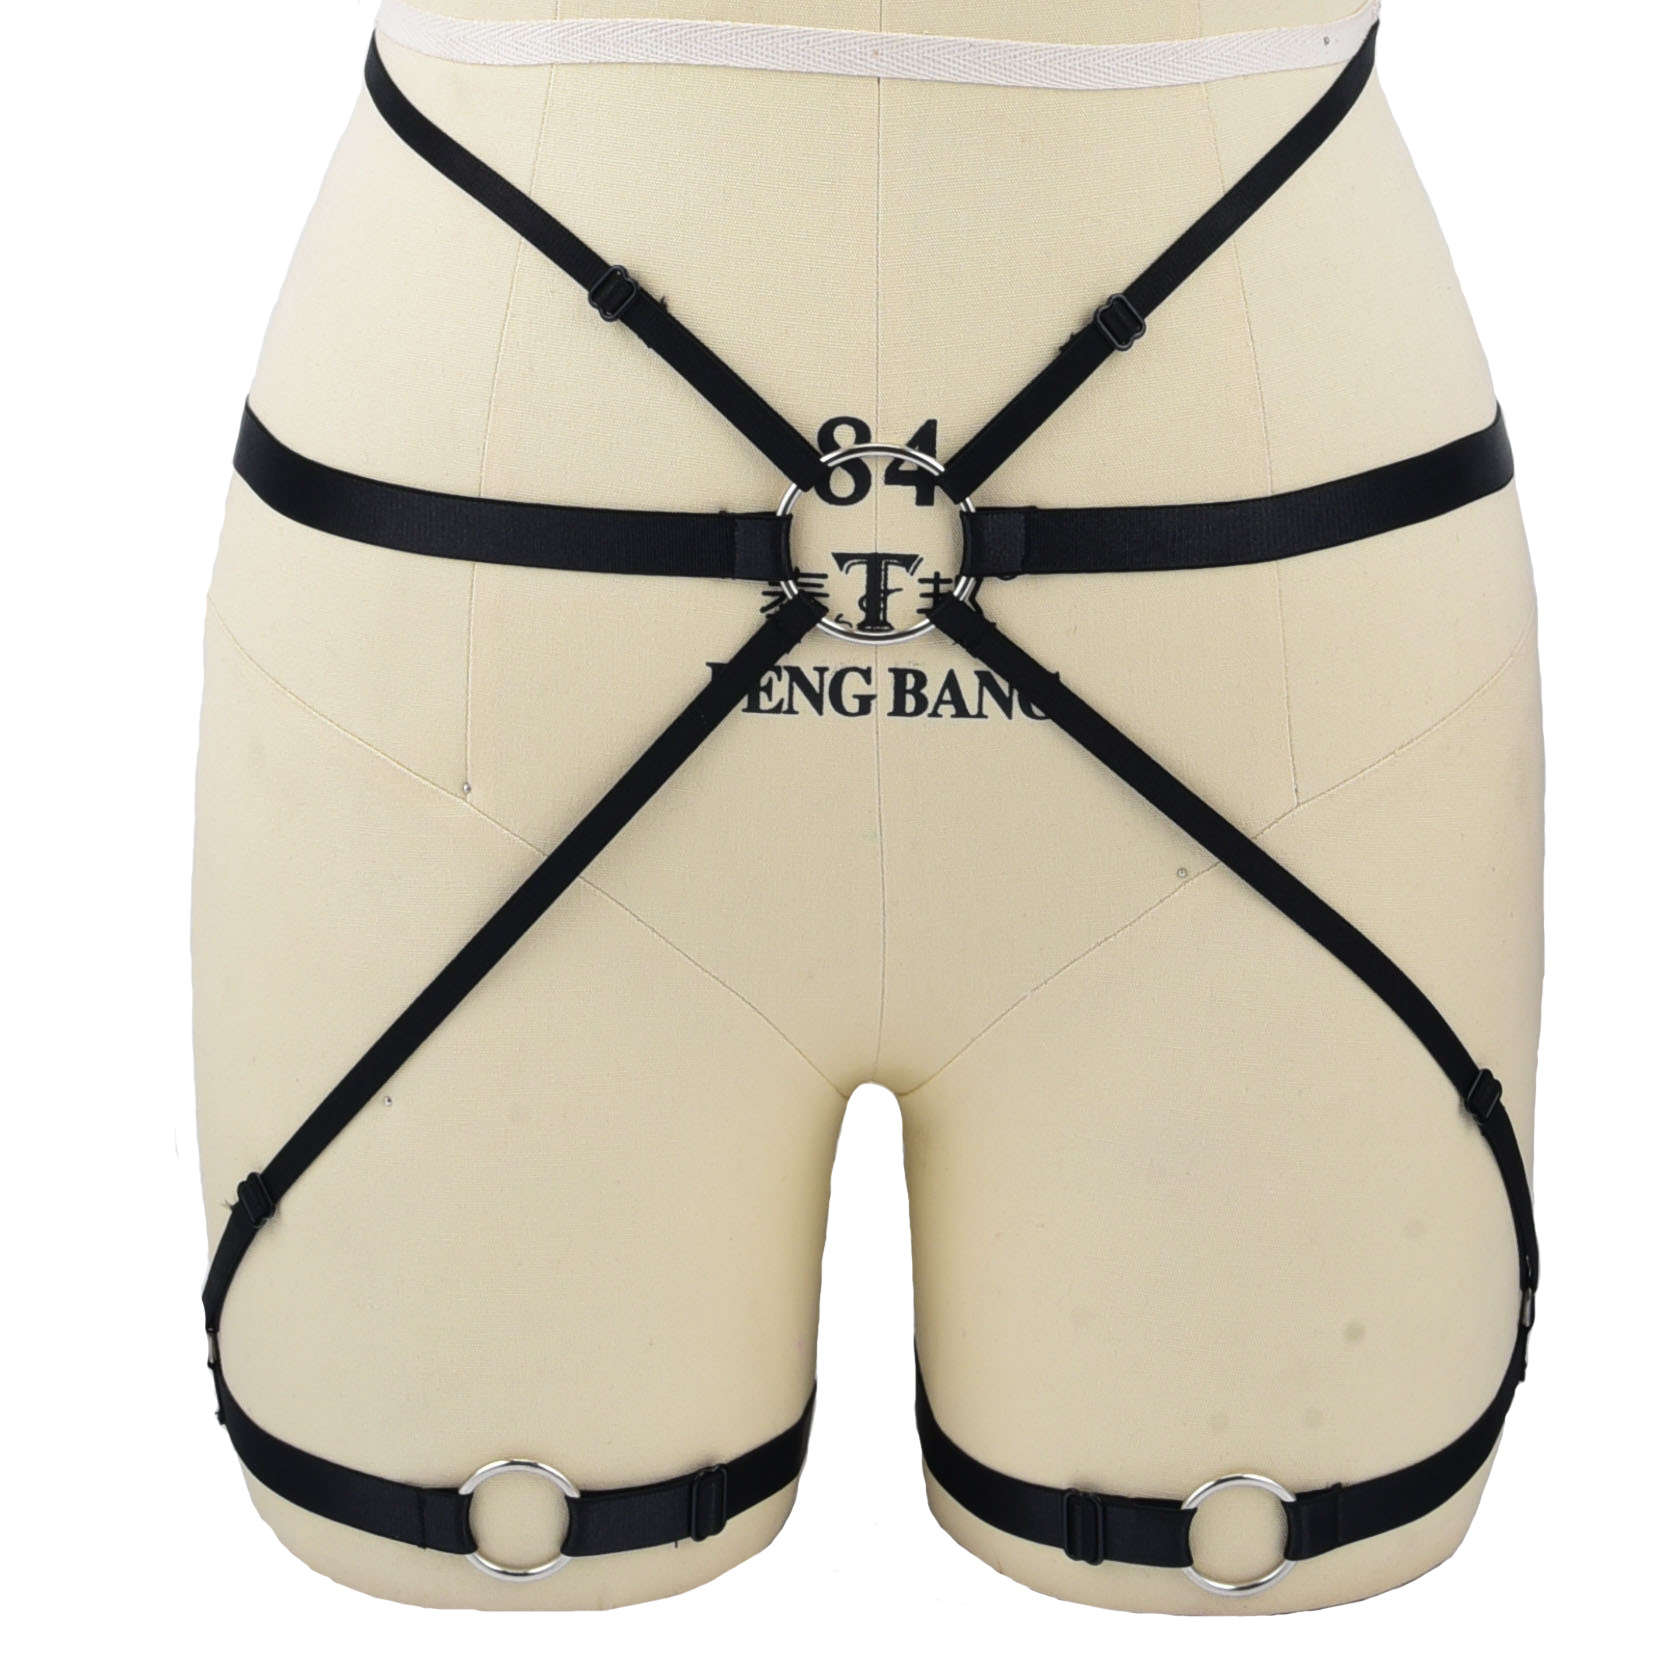 c2d5f9ac329 Hot Women Sexy Leg Garter Belt Elastic Cage Body Hollow Leg Garter Belt  Suspender Strap Underwear